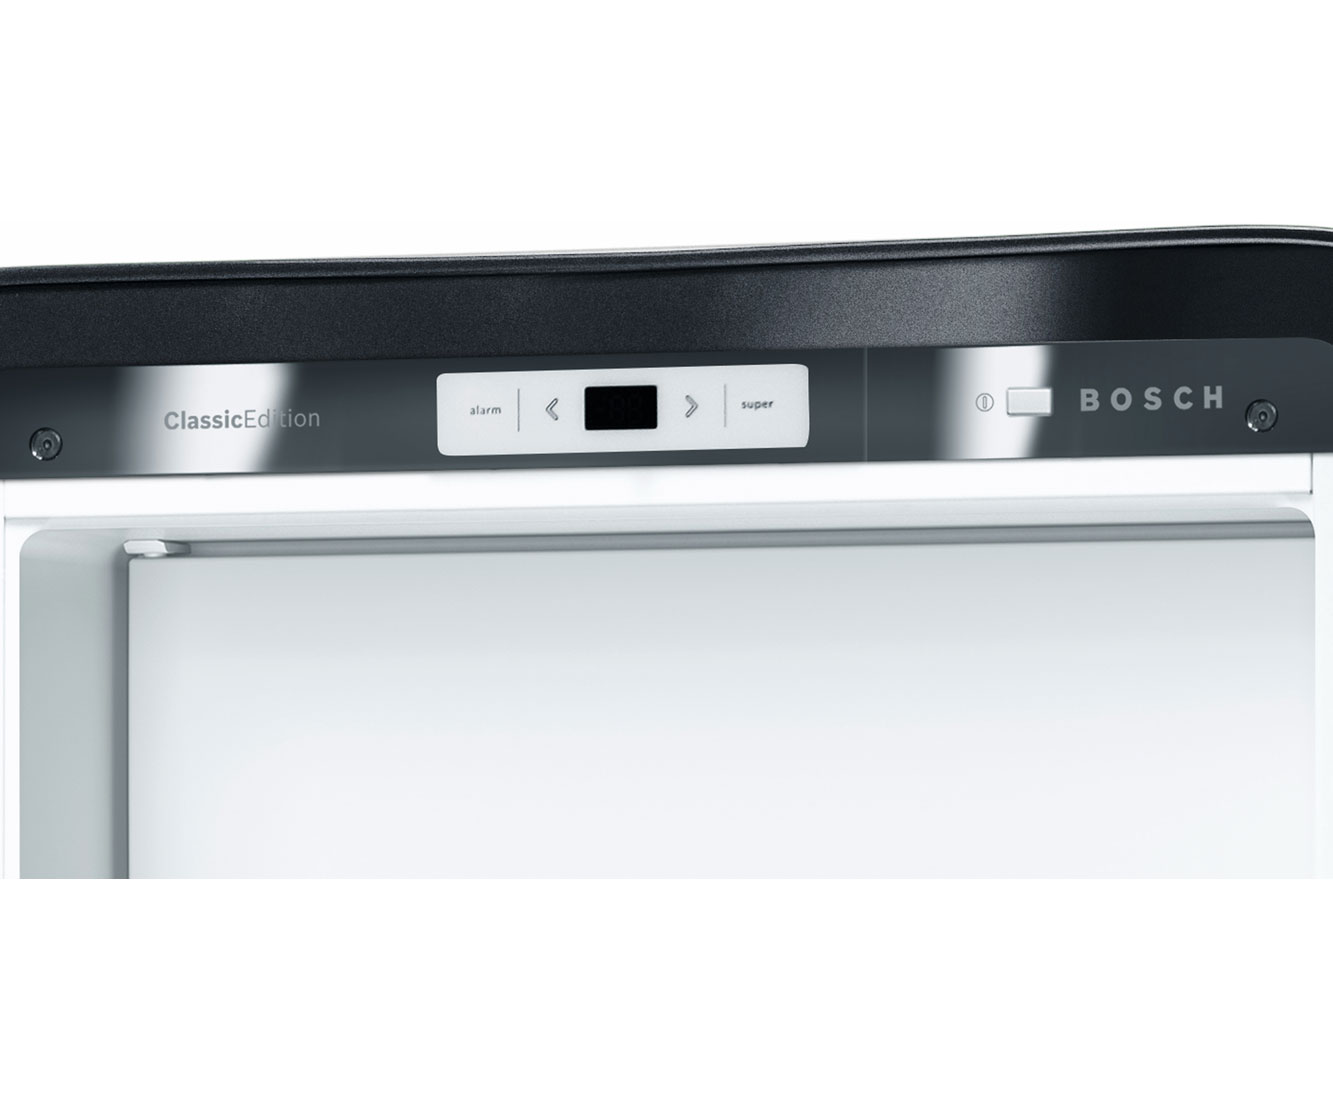 Bosch Kühlschrank Qc 421 : Bosch kühlschrank qc bosch no frost kühlschrank alarm bosch